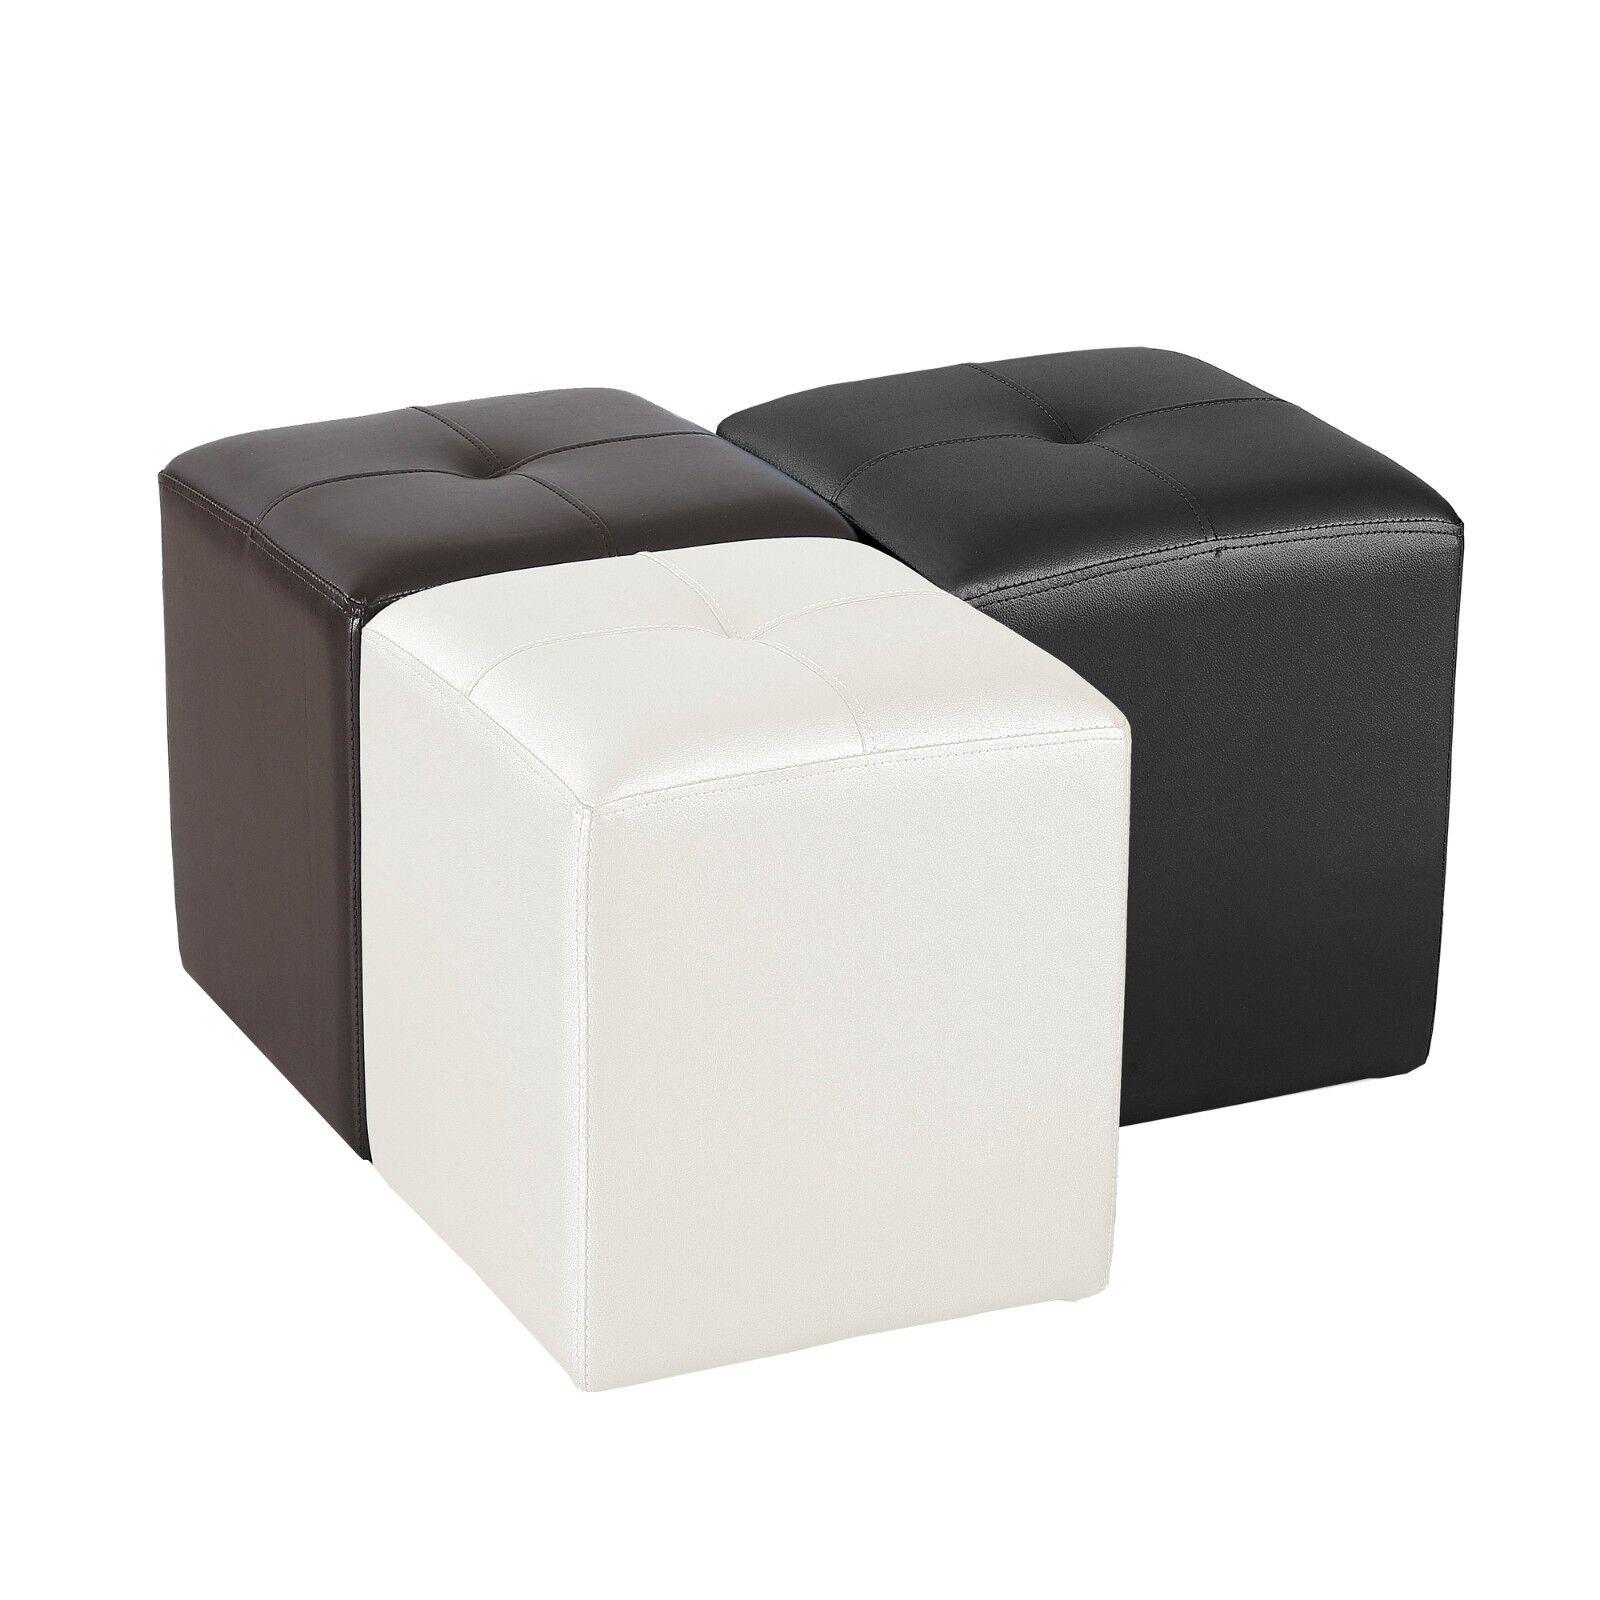 Puff En Banco Dise O Pouf Puf Paf Sof Novedad Blanco Y Nego 3  # Muebles Puffs Baratos